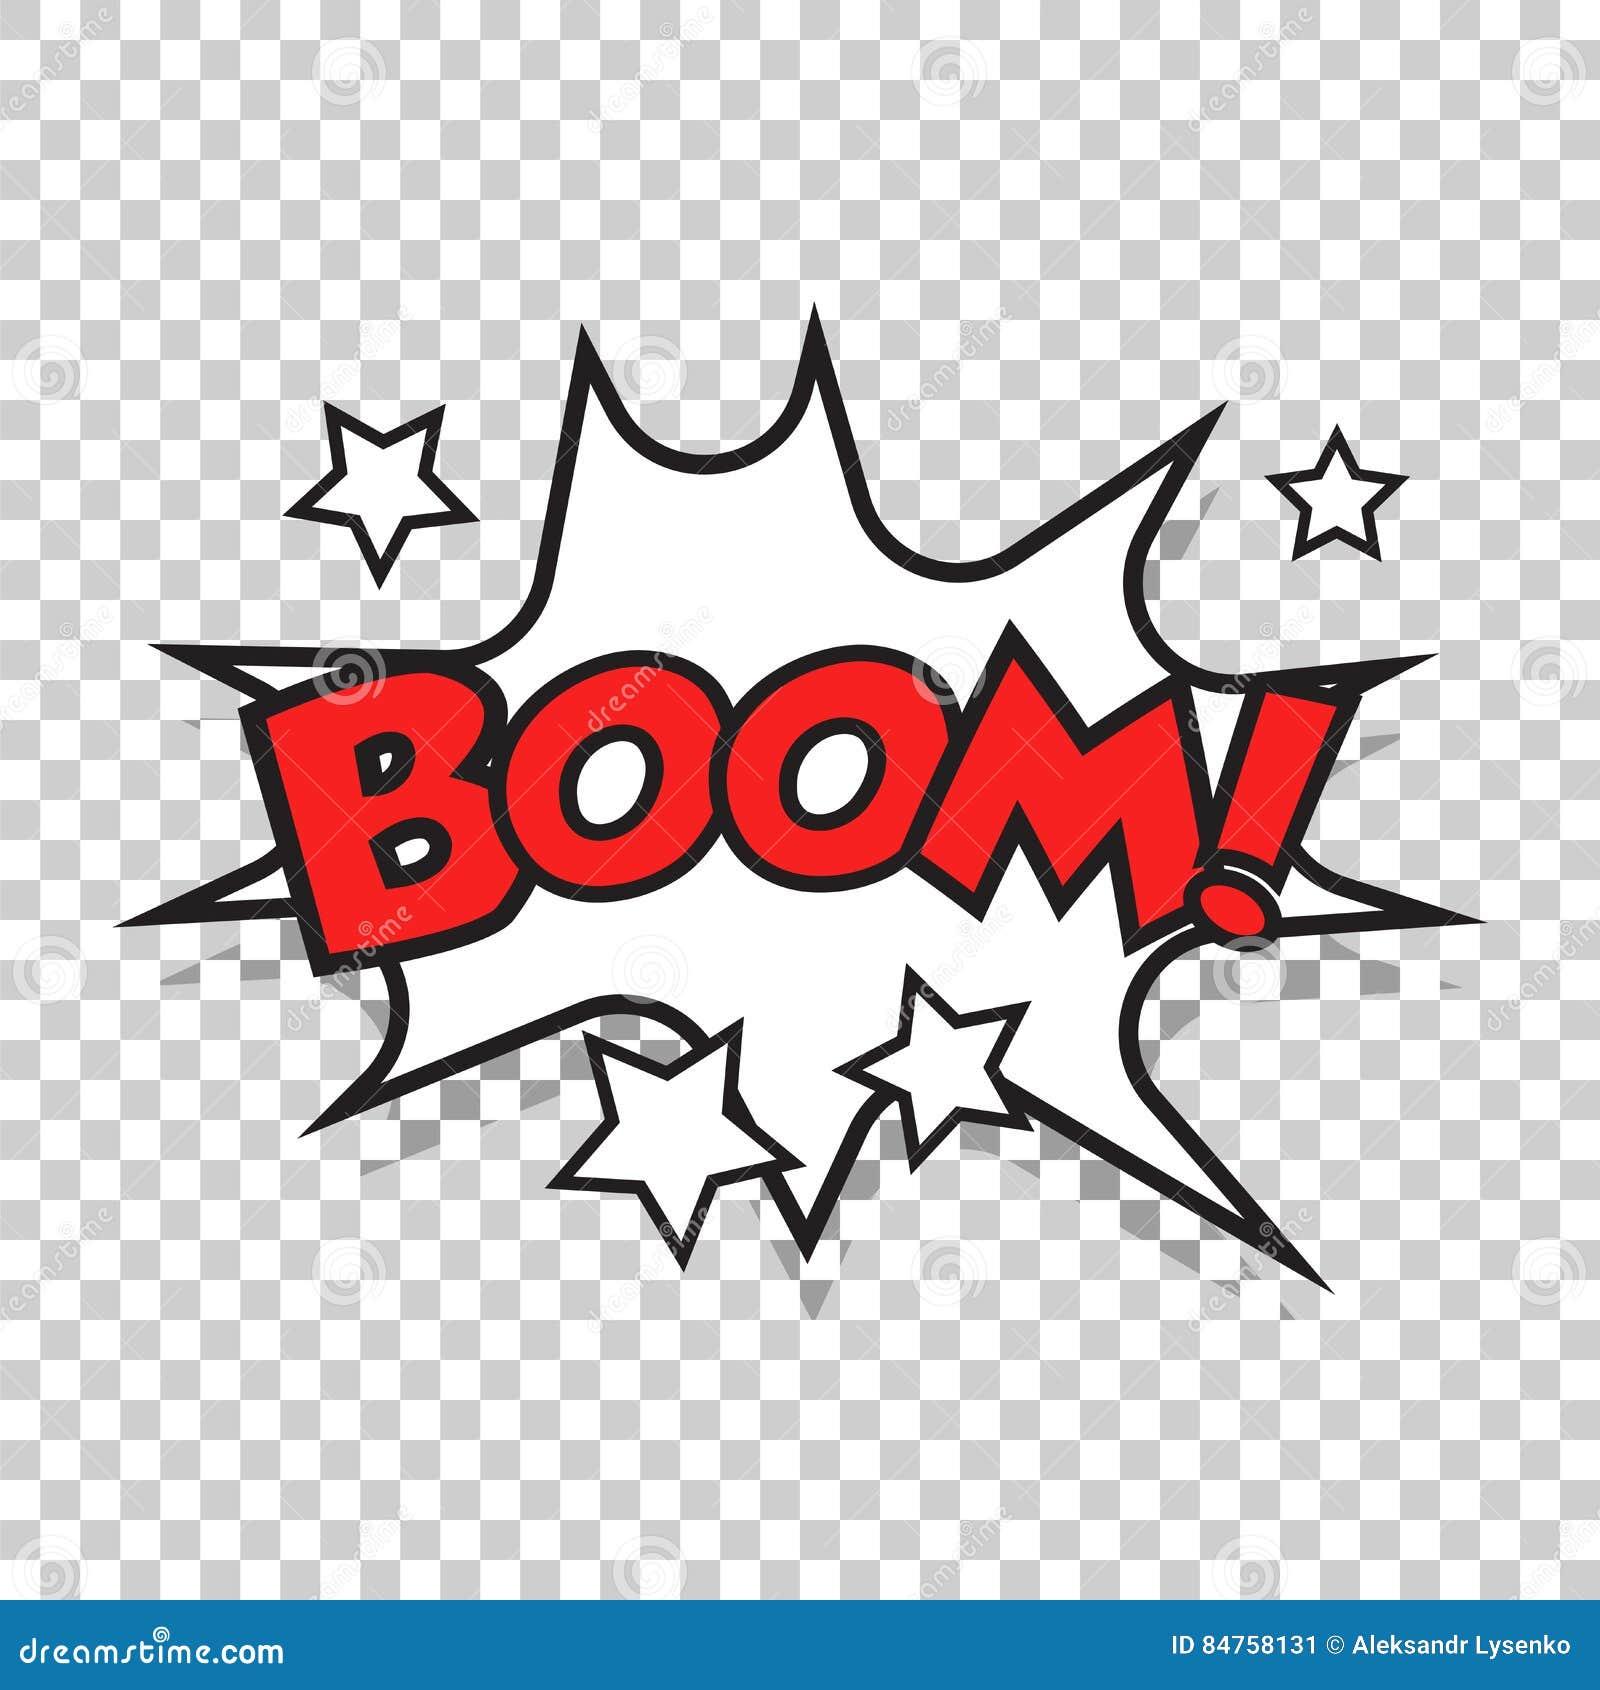 Sound effect boom download